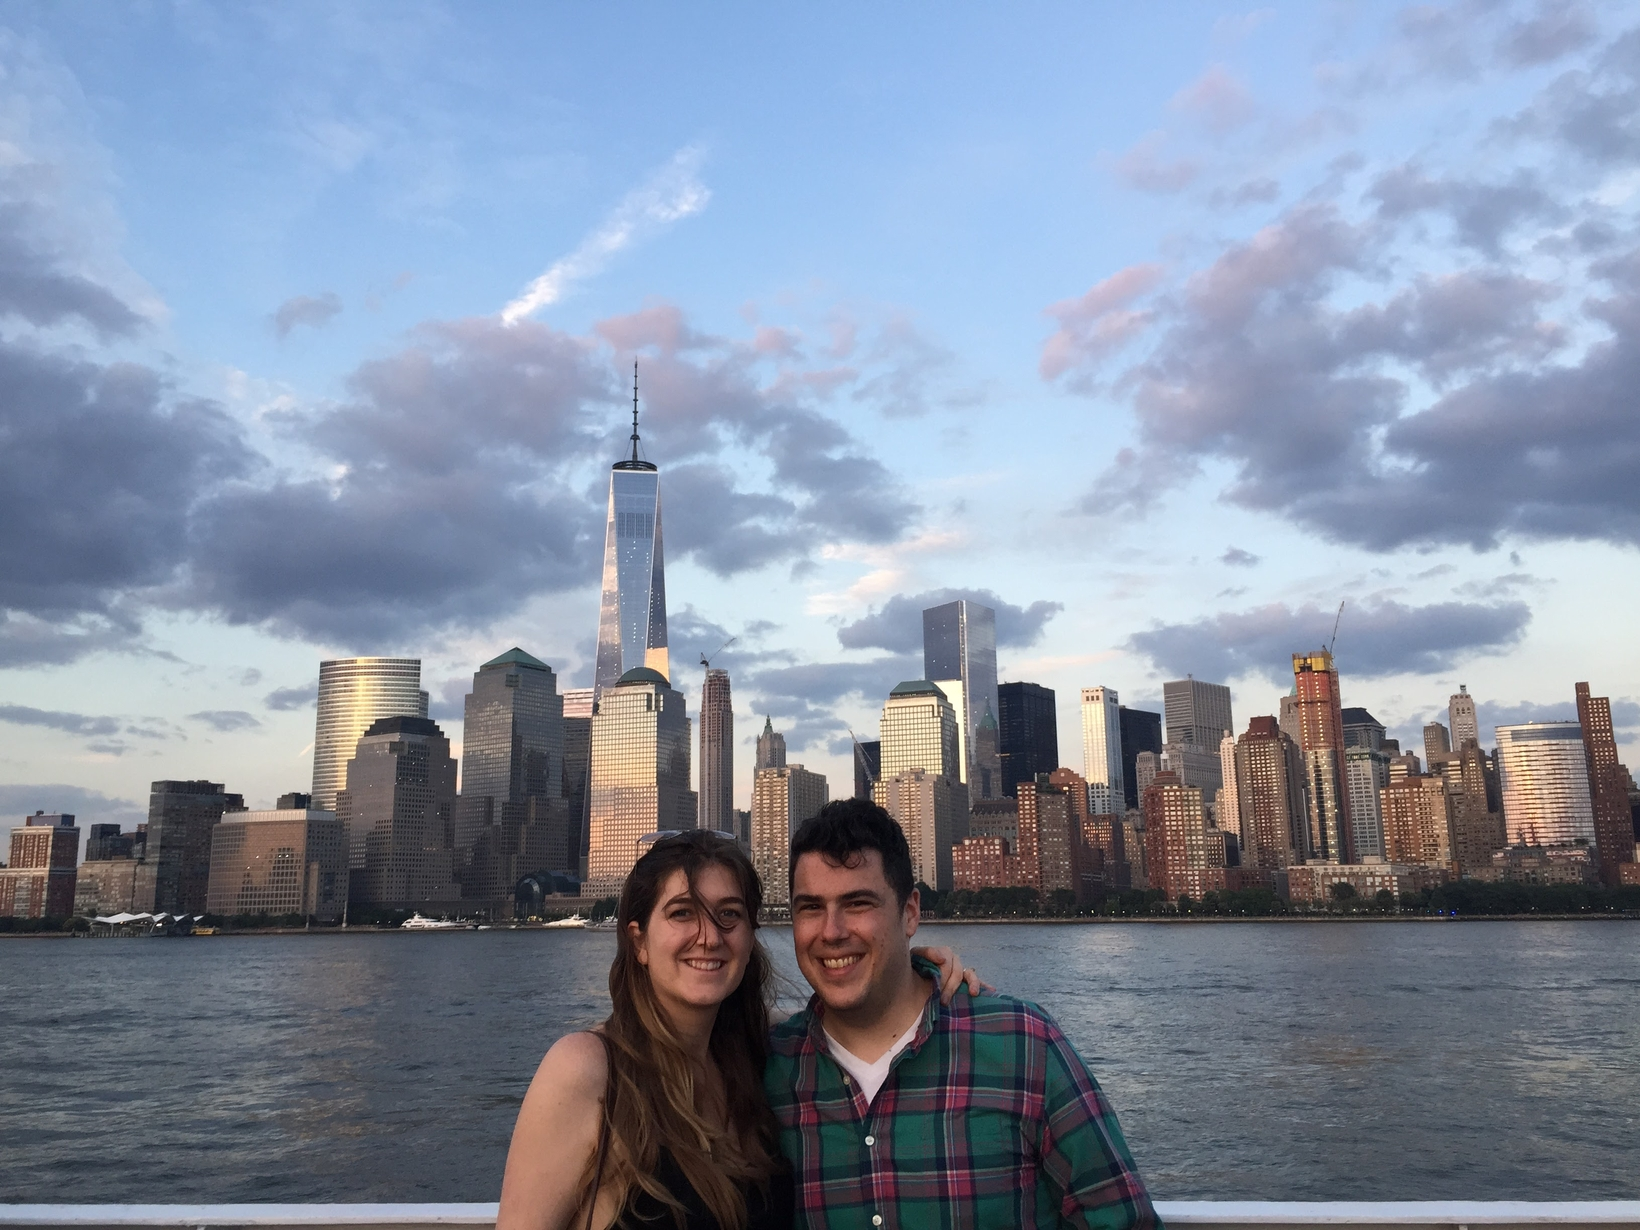 Josh & Renee from Charlotte, North Carolina, United States